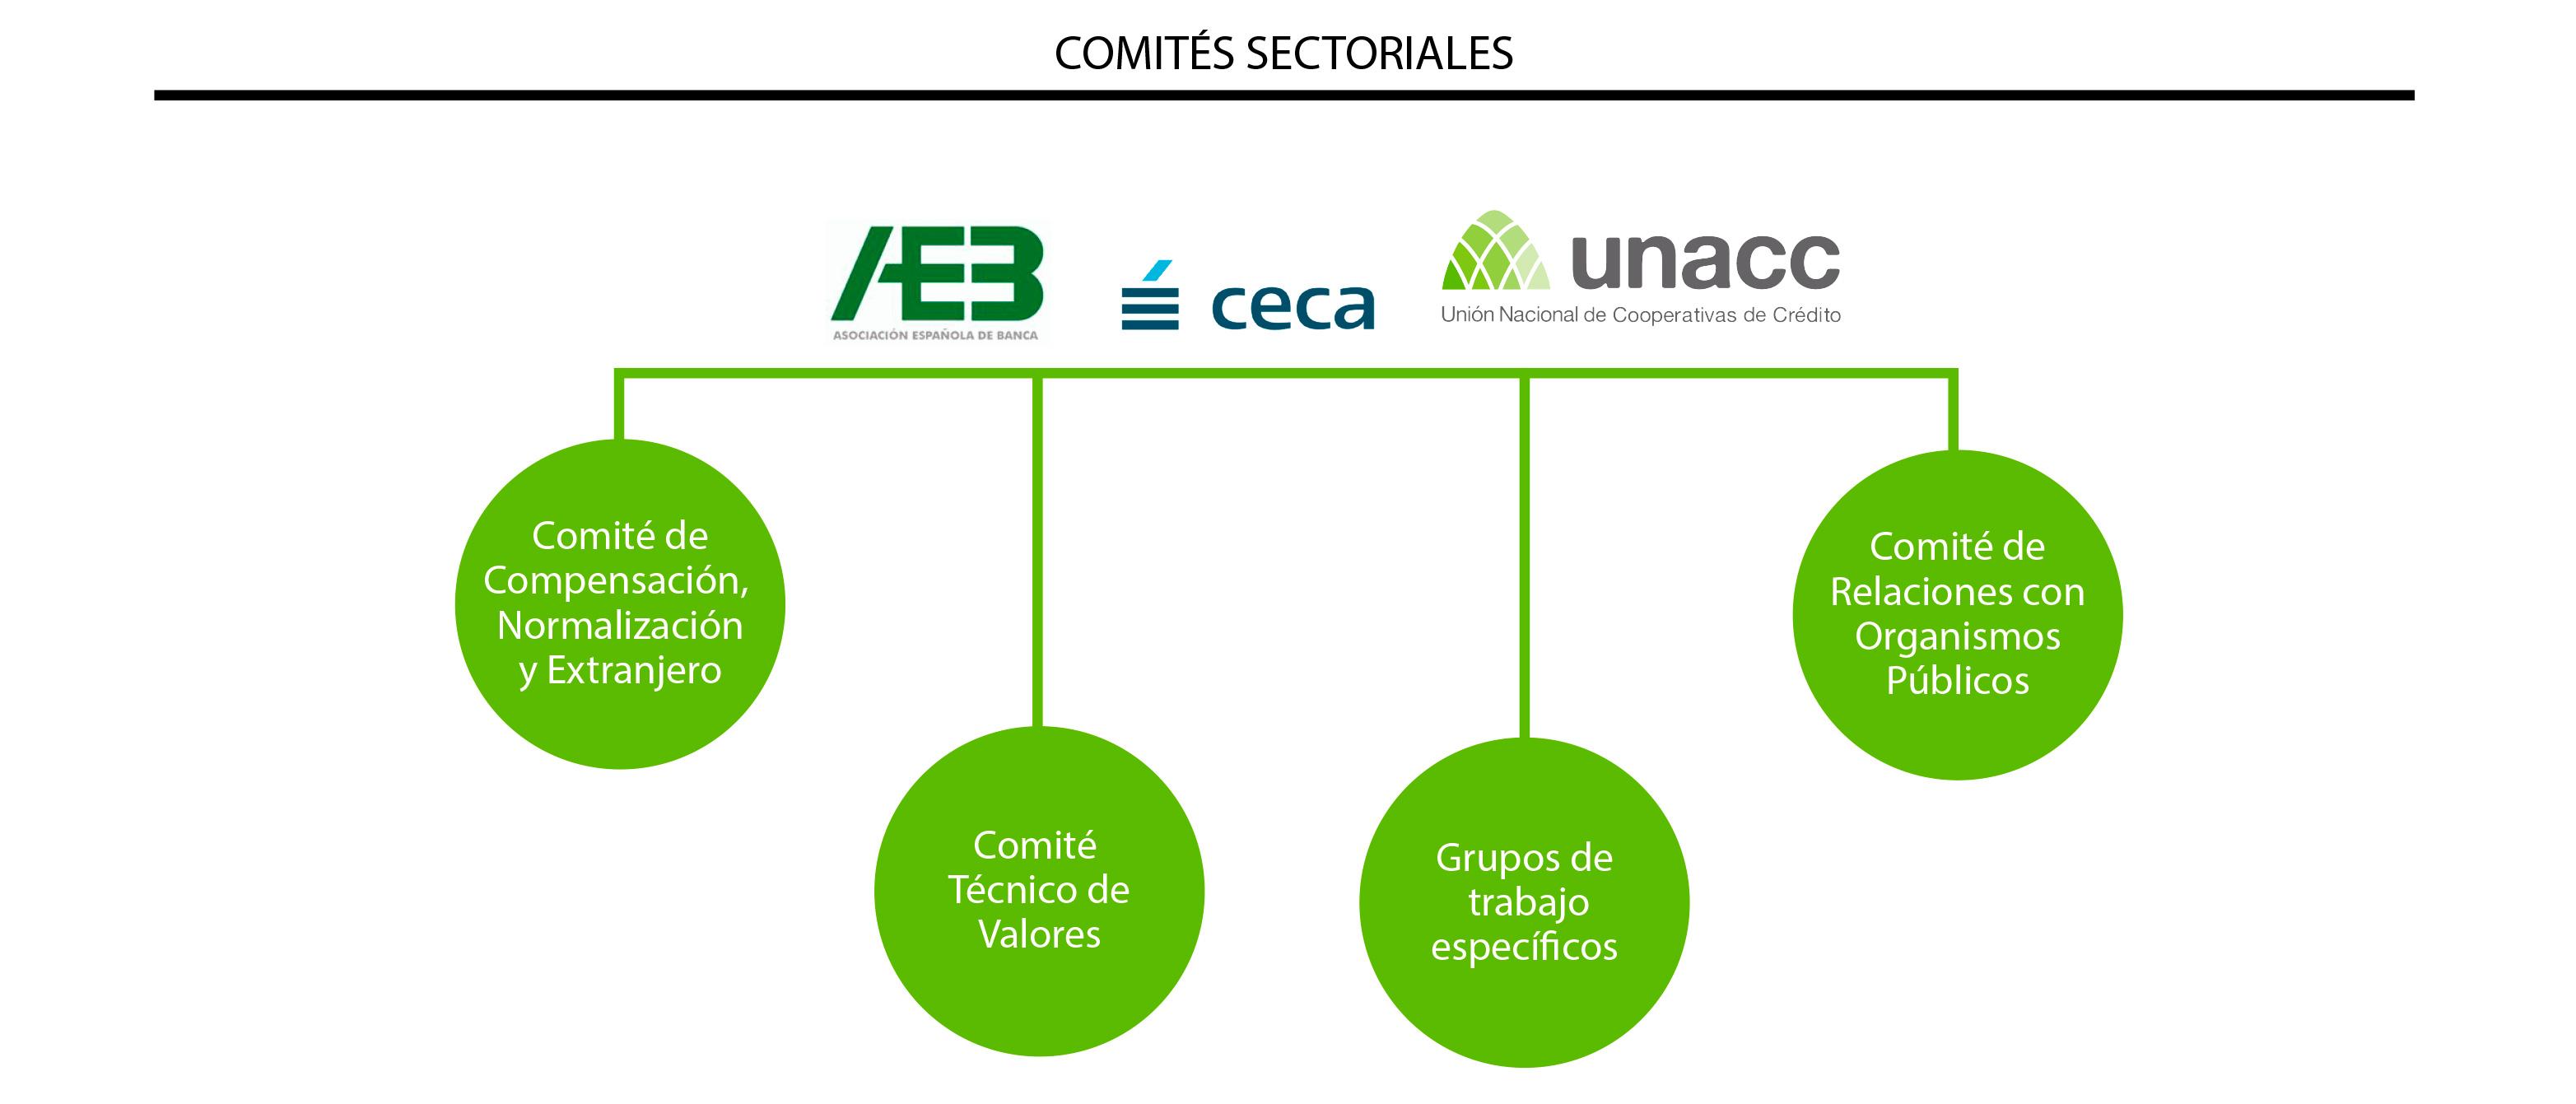 Comites sectoriales